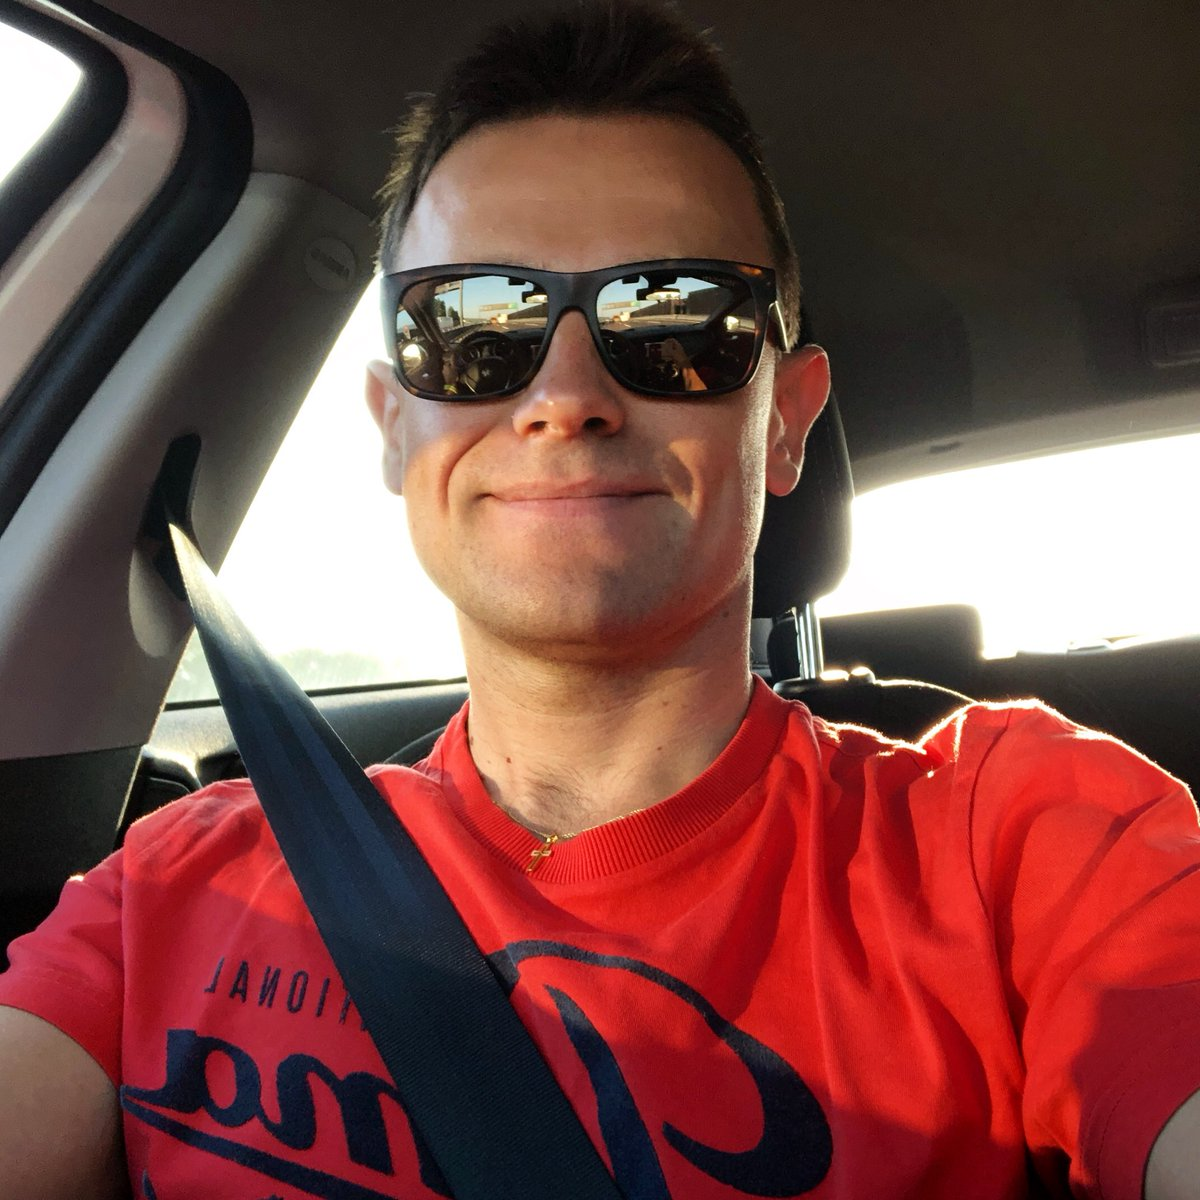 Very good morning, on my way to maranello for F1 Simulator @ScuderiaFerrari @FerrariRaces #goodmorning #alfaromeogiulietta @serengetieyewear